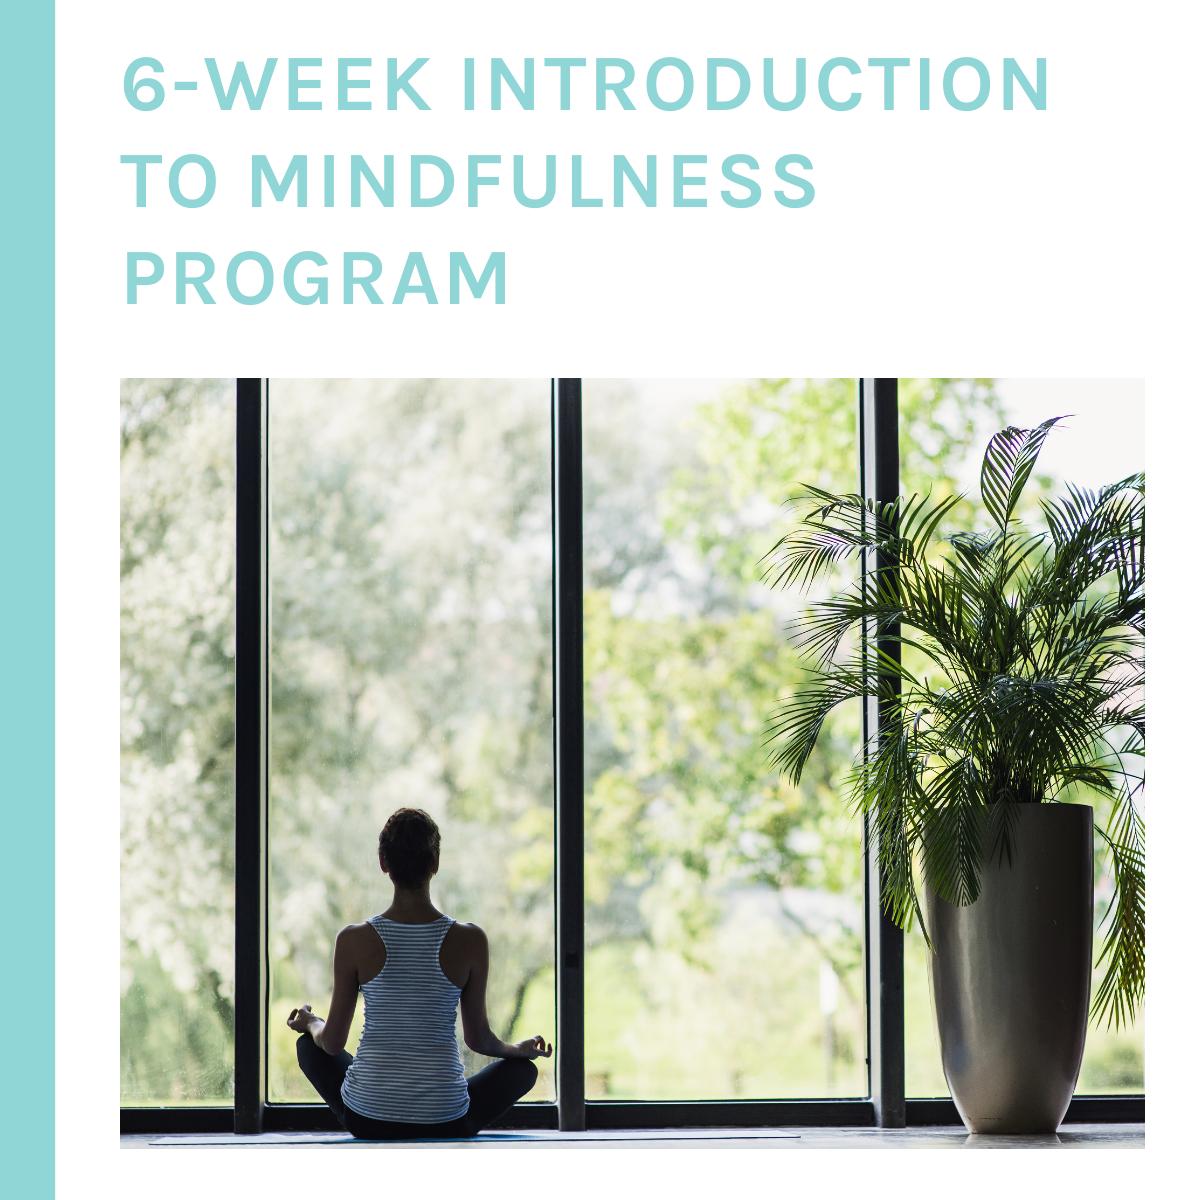 6-Week introduction to Mindfulness Program